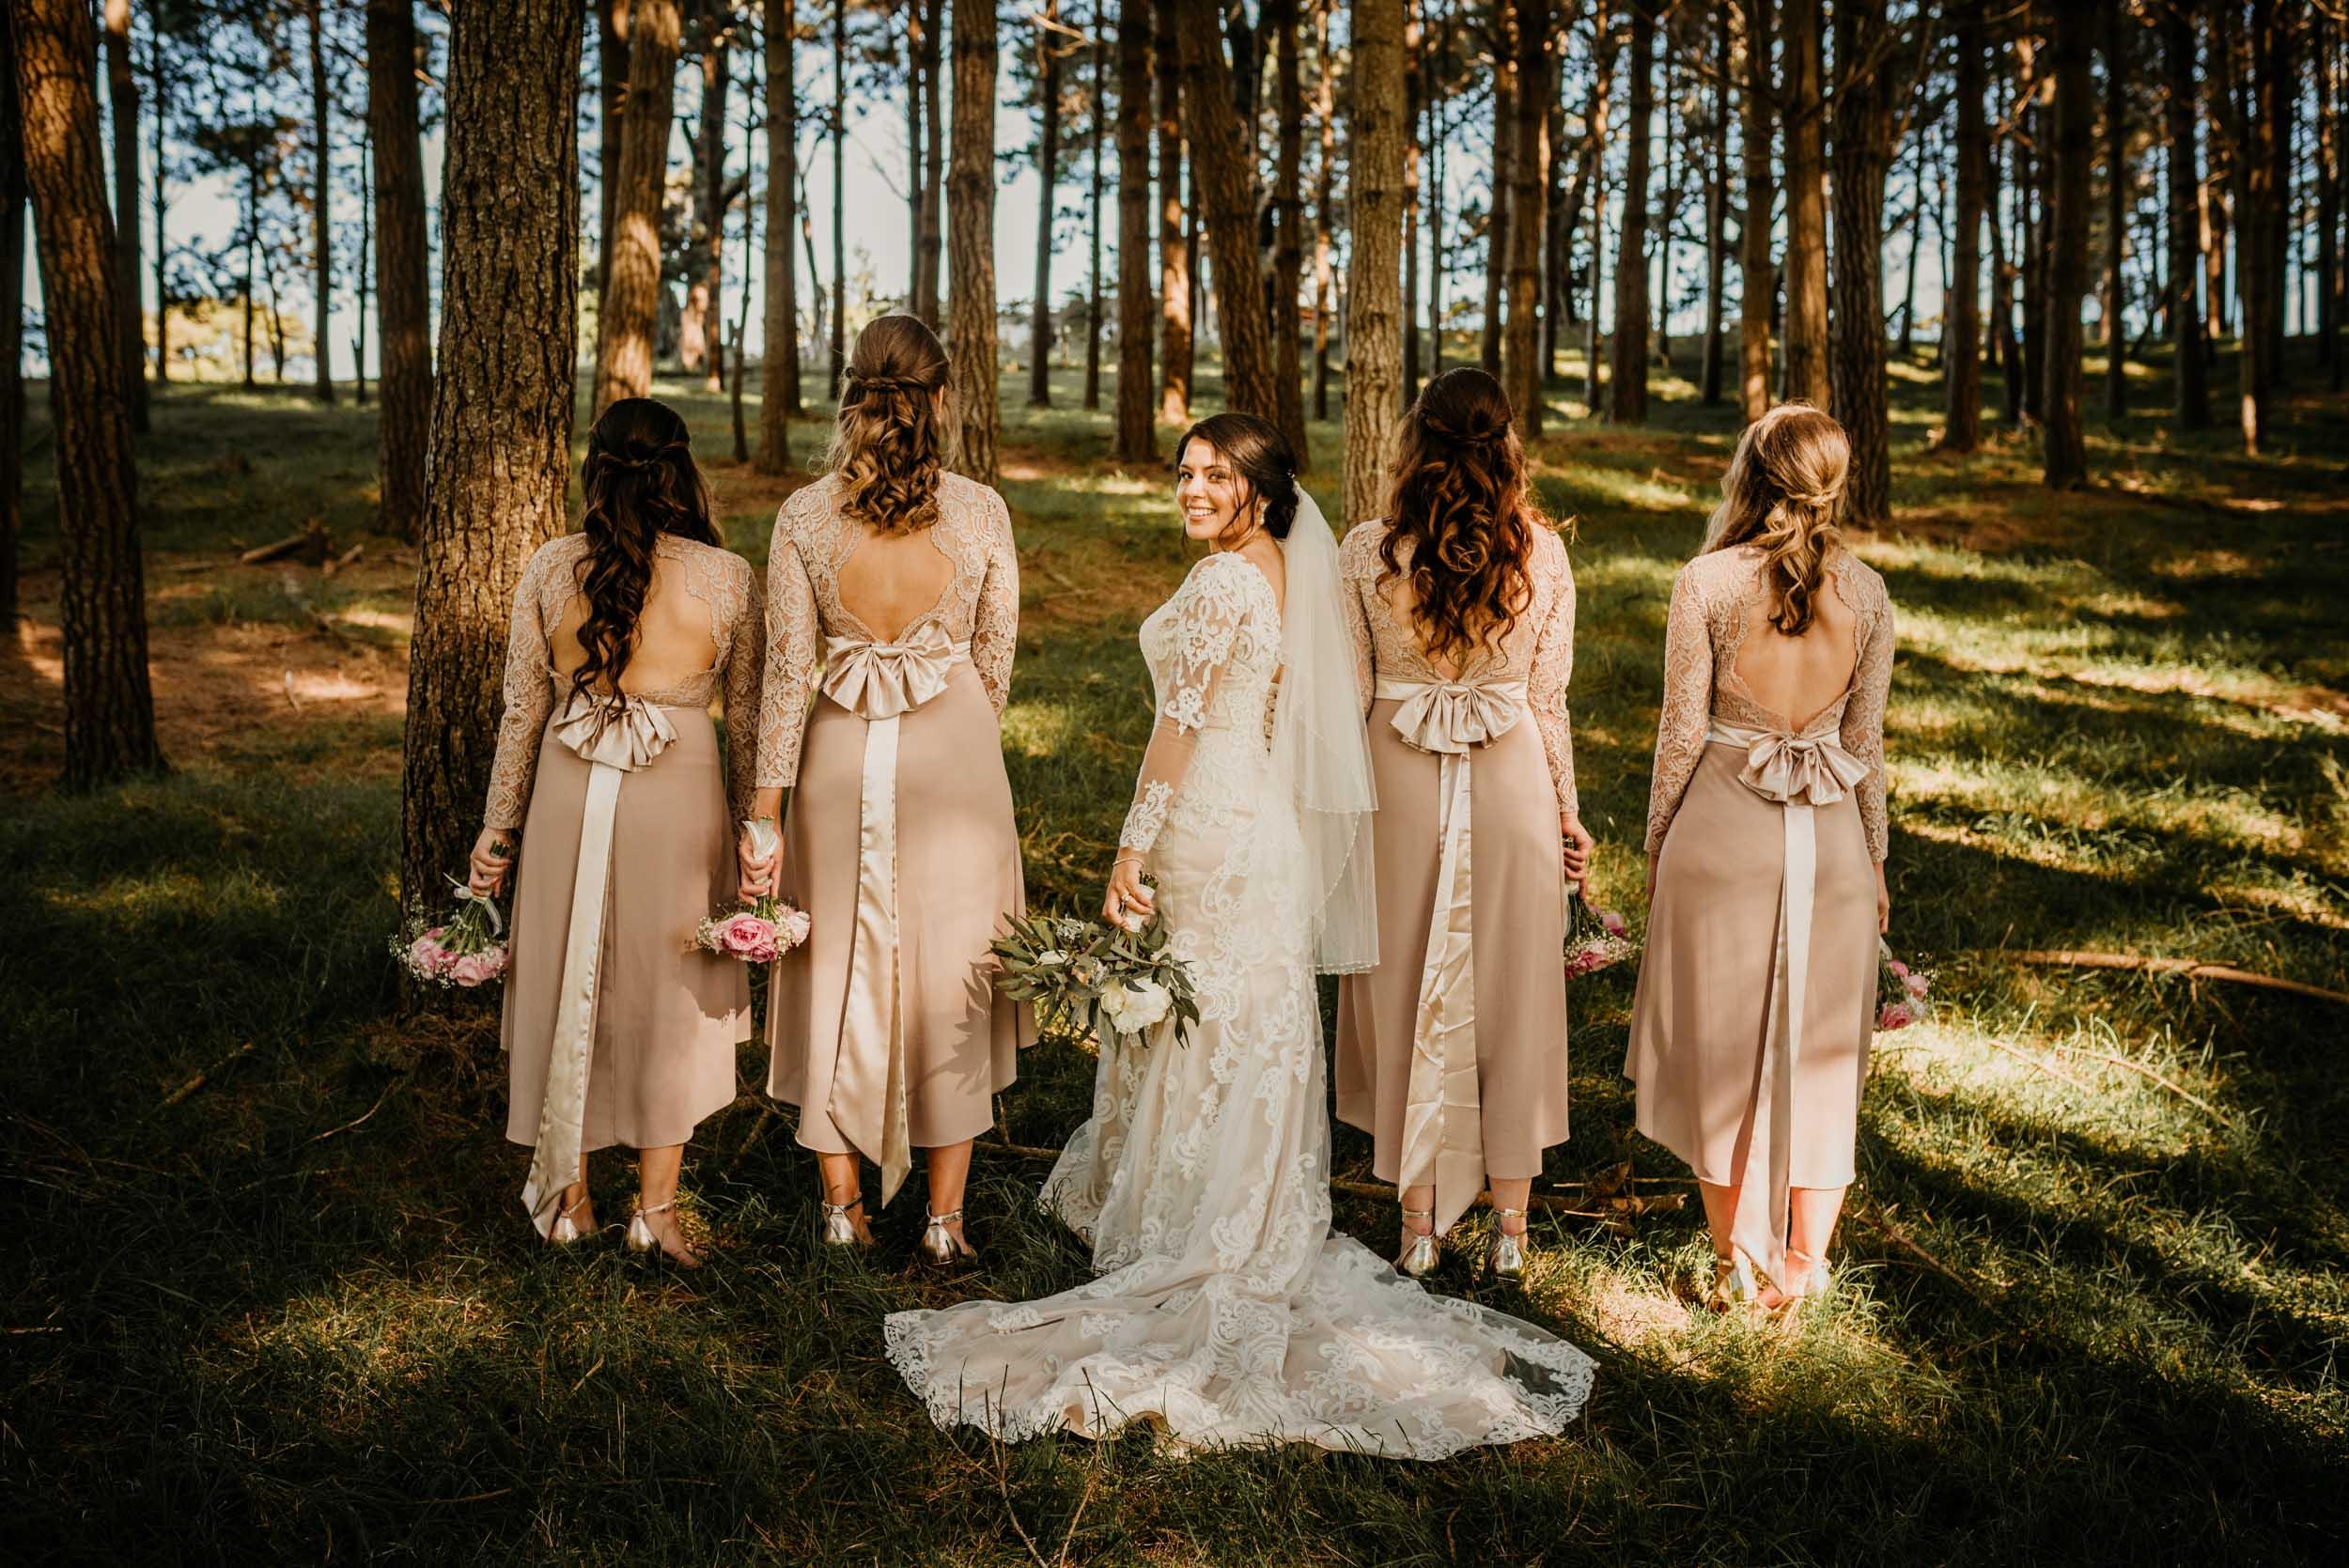 The Raw Photographer - Cairns Wedding Photographer - New Zealand Destination Photography - Travel - Australian-11.jpg